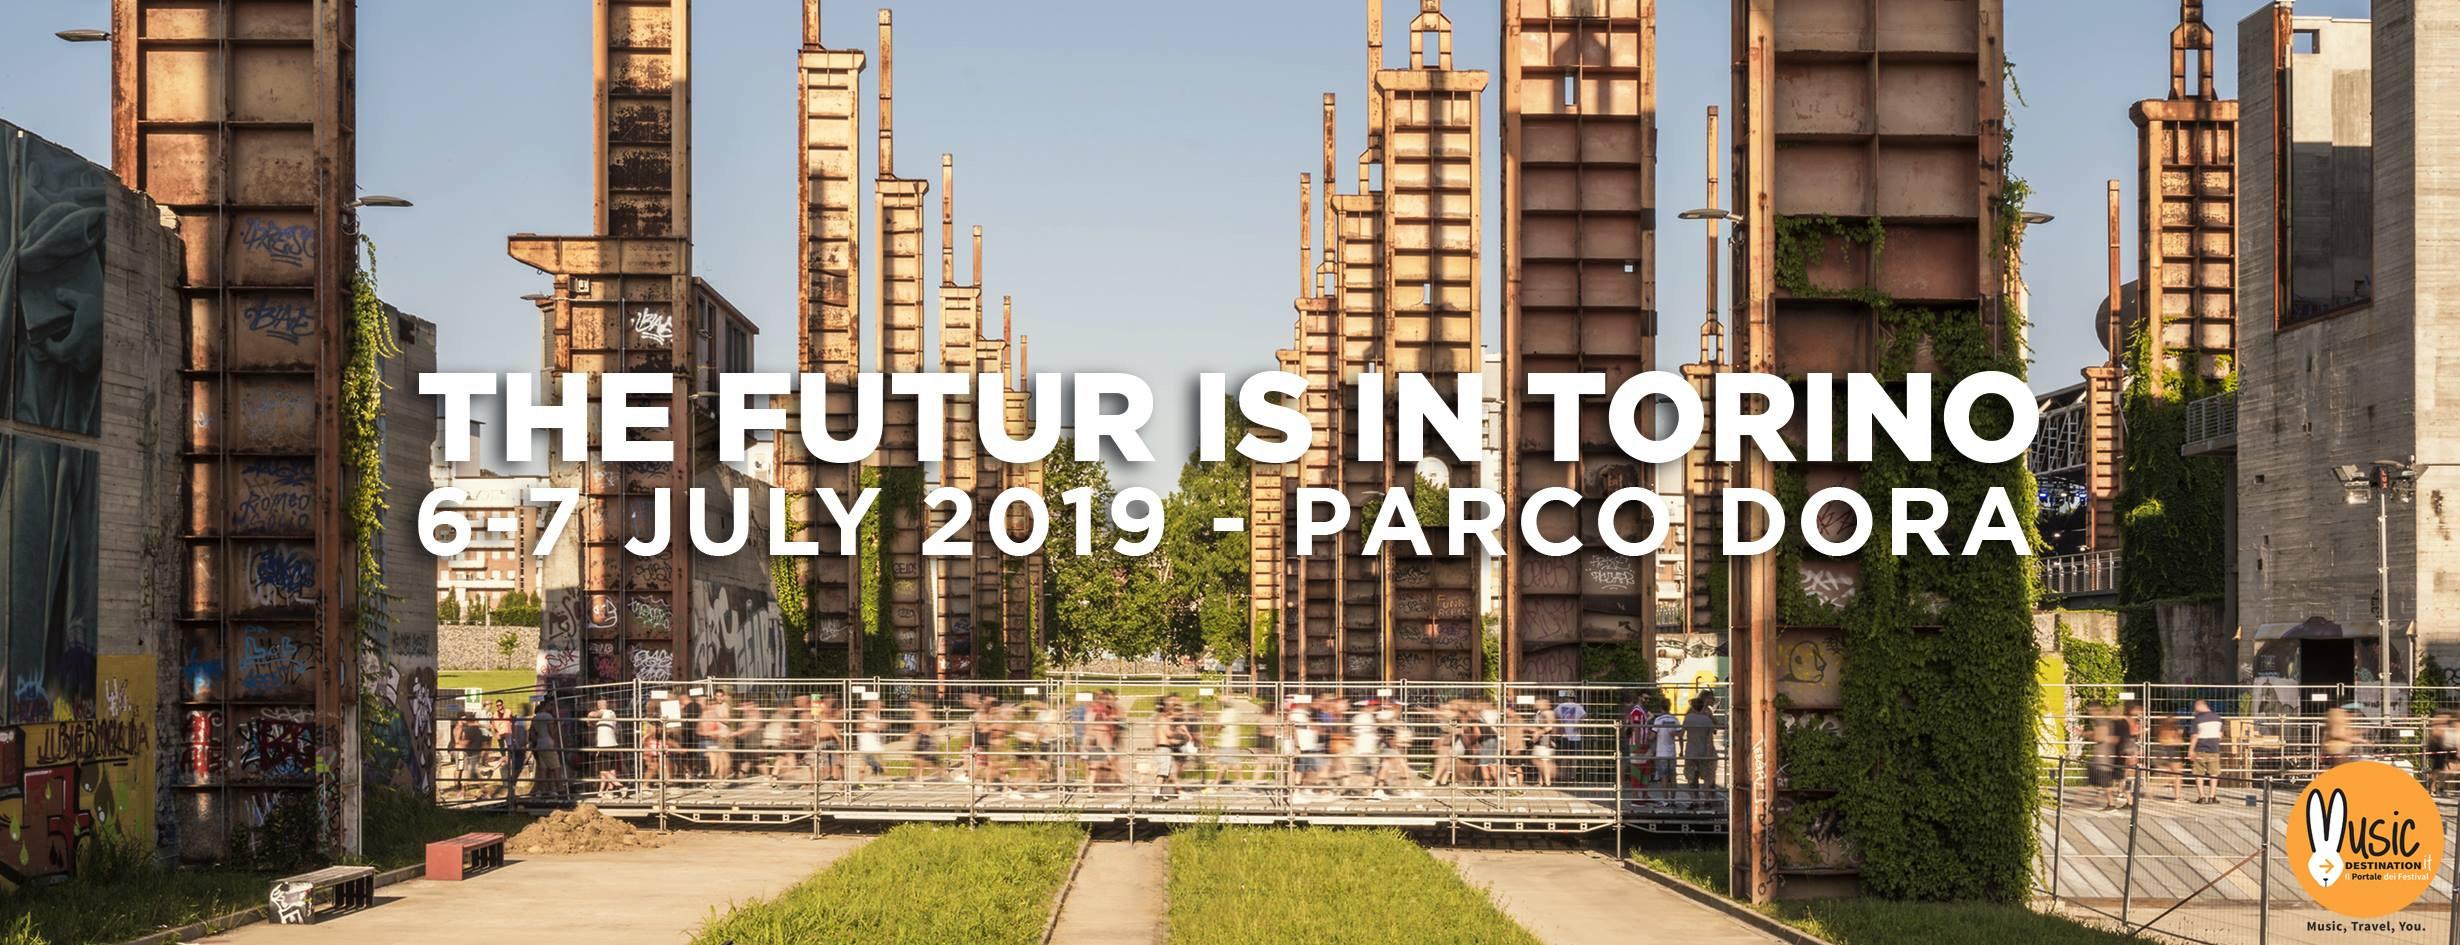 Kappa Futurfestival 2019 line up 2